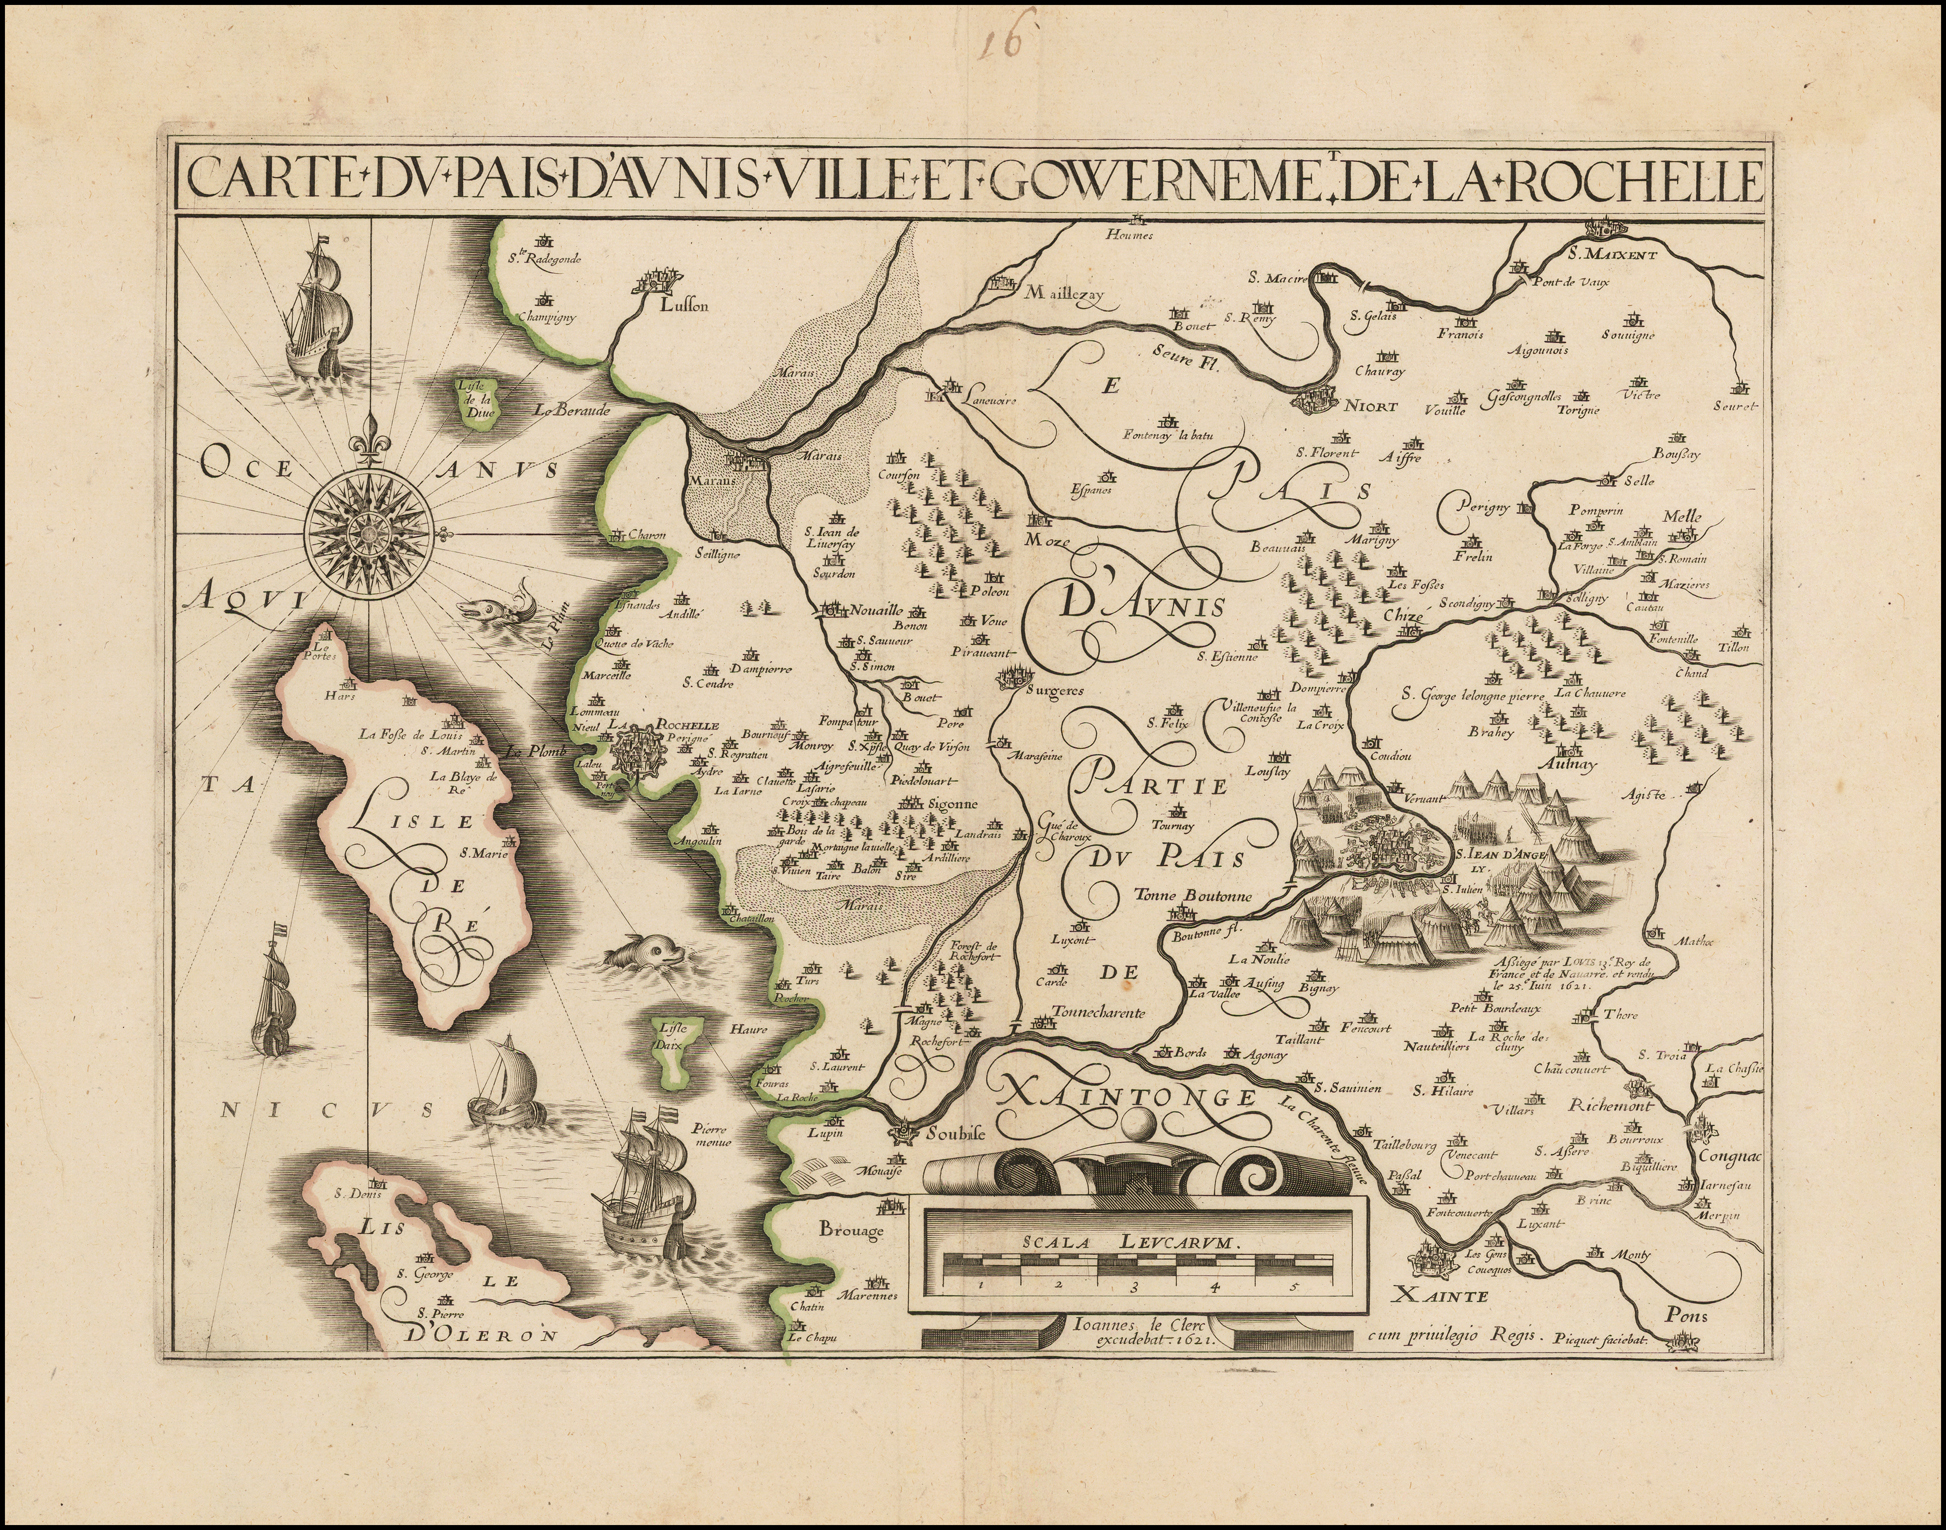 la rochelle karte File:Karte von La Rochelle und Umgebung (1621)   Jean Le Clerc.